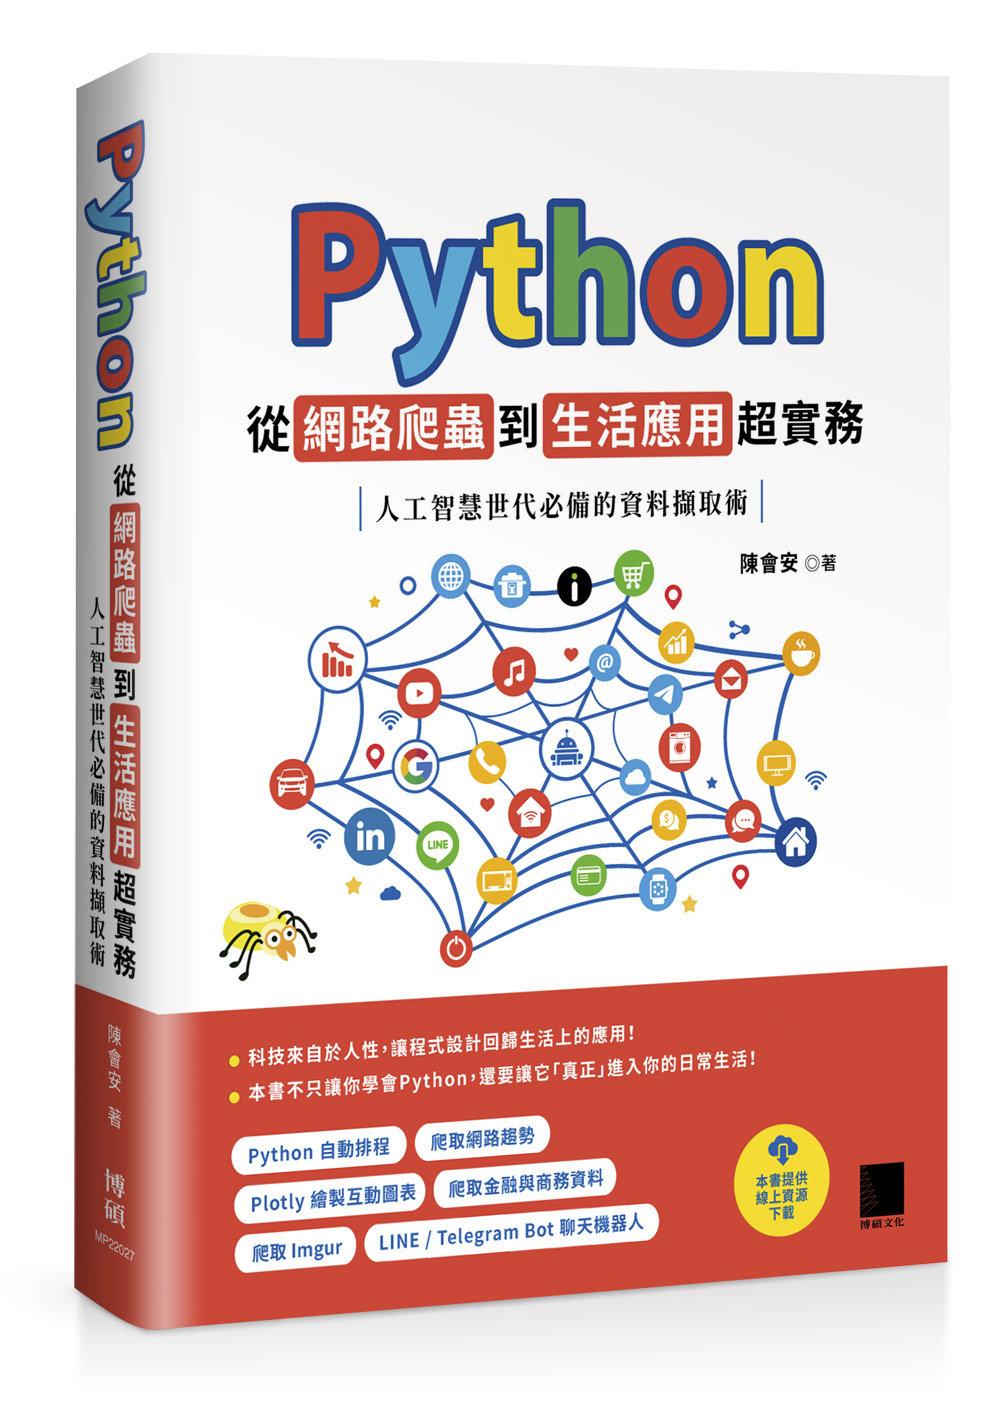 Python 從網路爬蟲到生活應用超實務:人工智慧世代必備的資料擷取術-preview-1